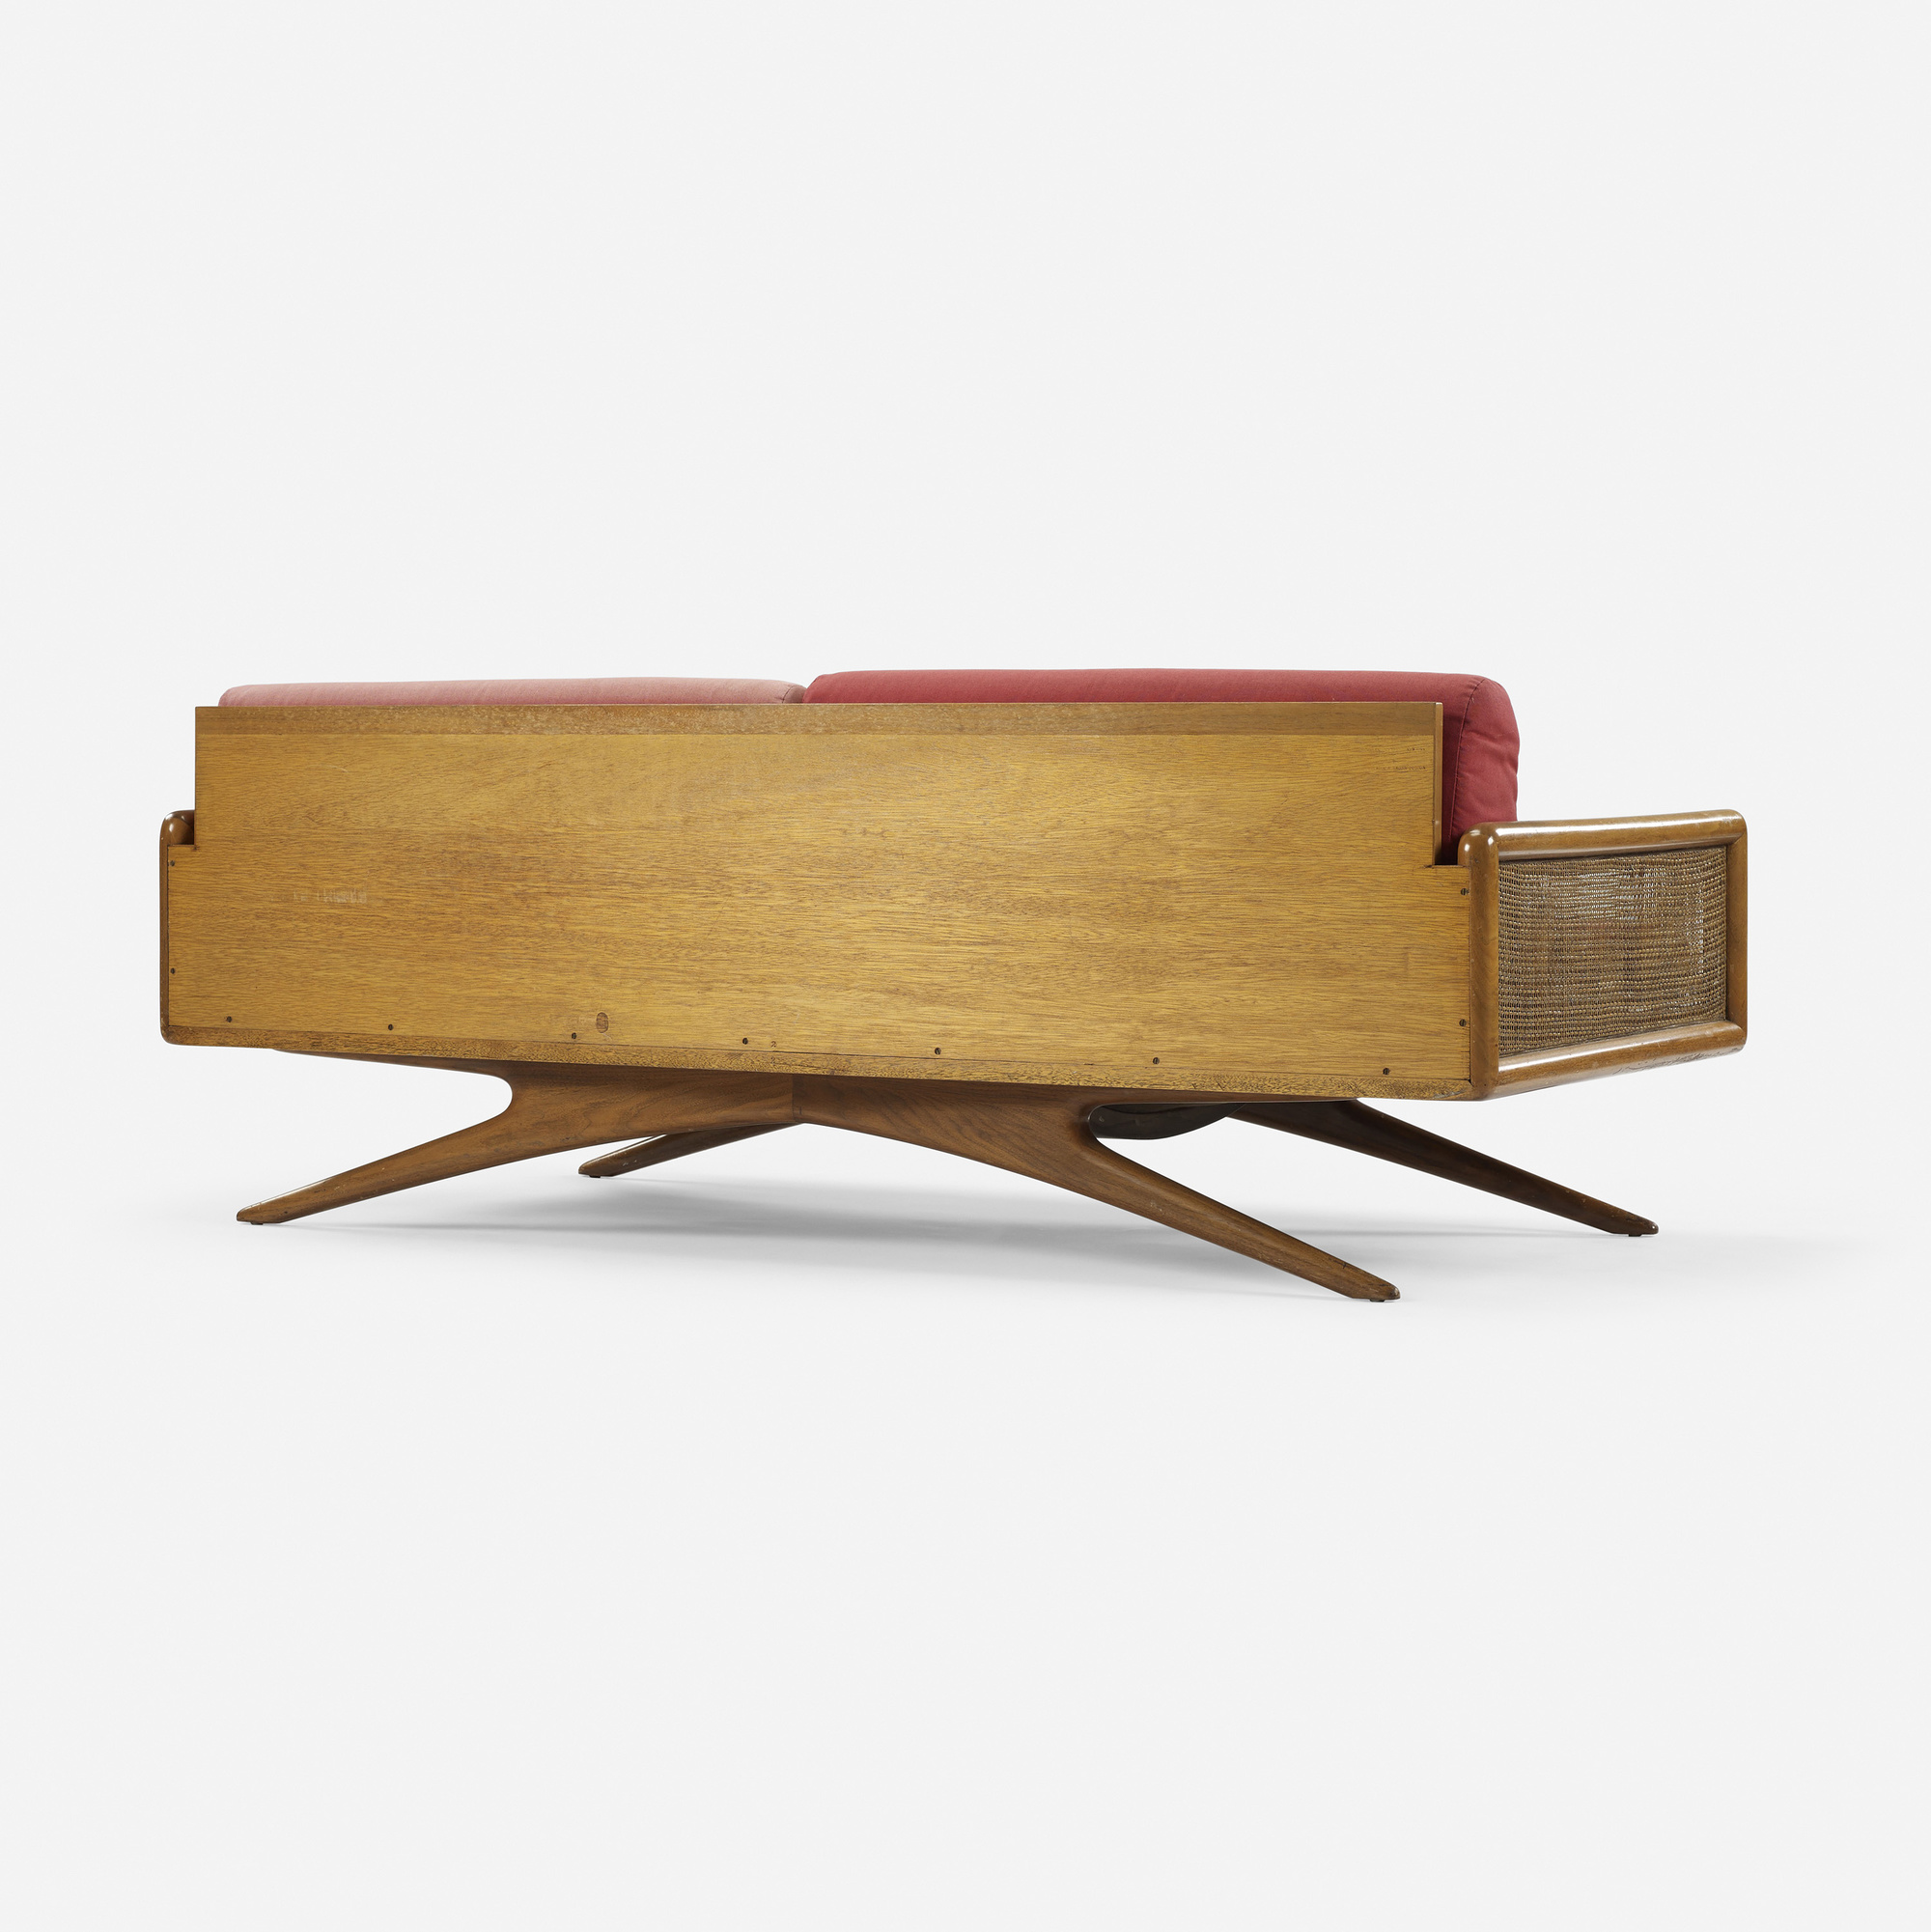 298 Vladimir Kagan sofa Design 11 June 2015 Auctions